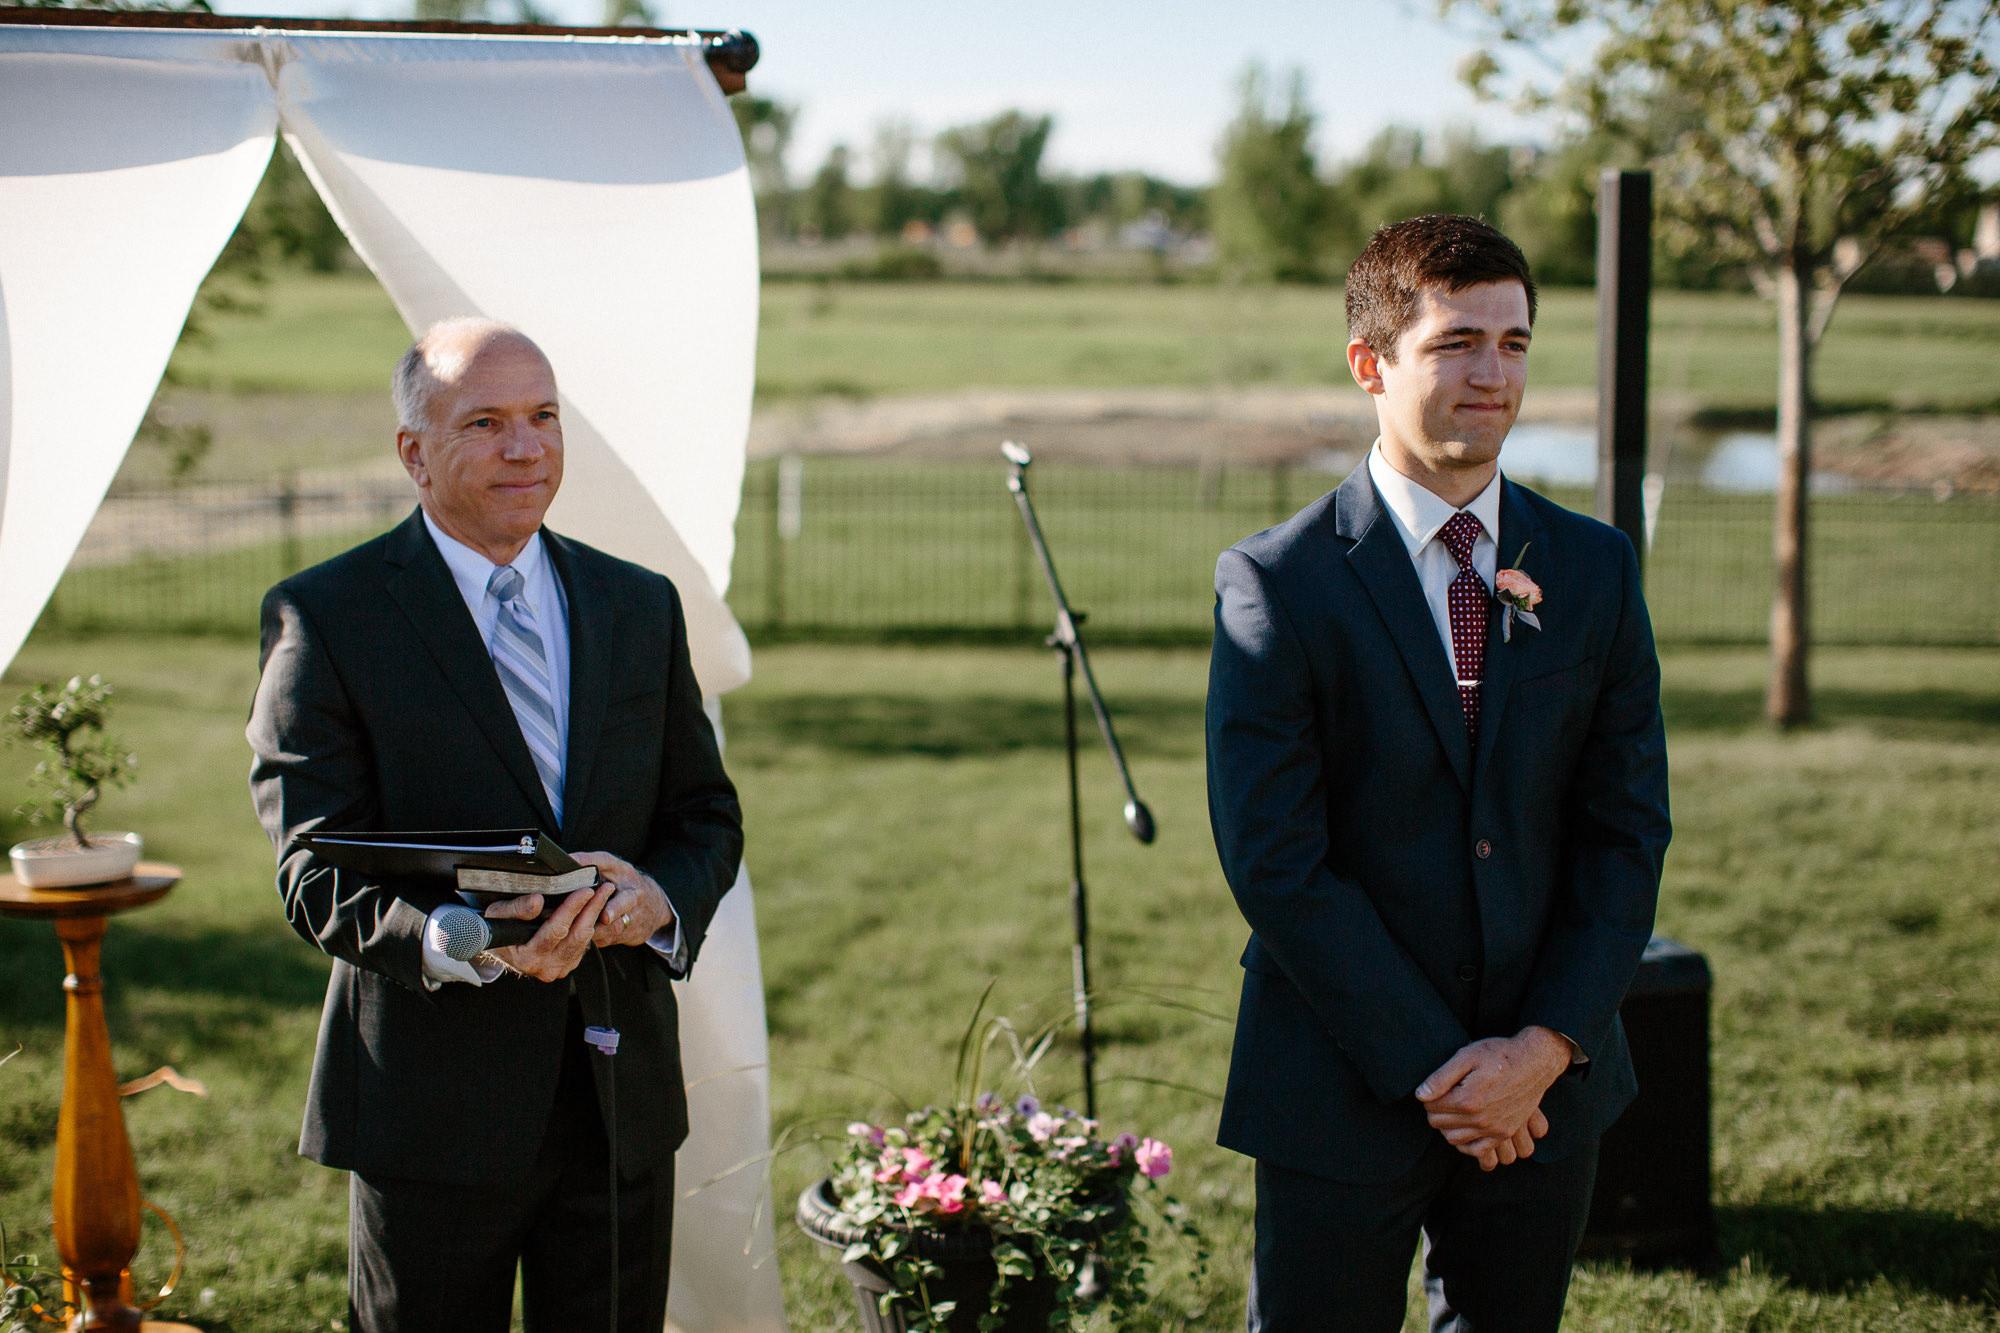 wedding-elopement-adventerous-romantic-timeless-south-dakota-blue-haven-barn-036.jpg